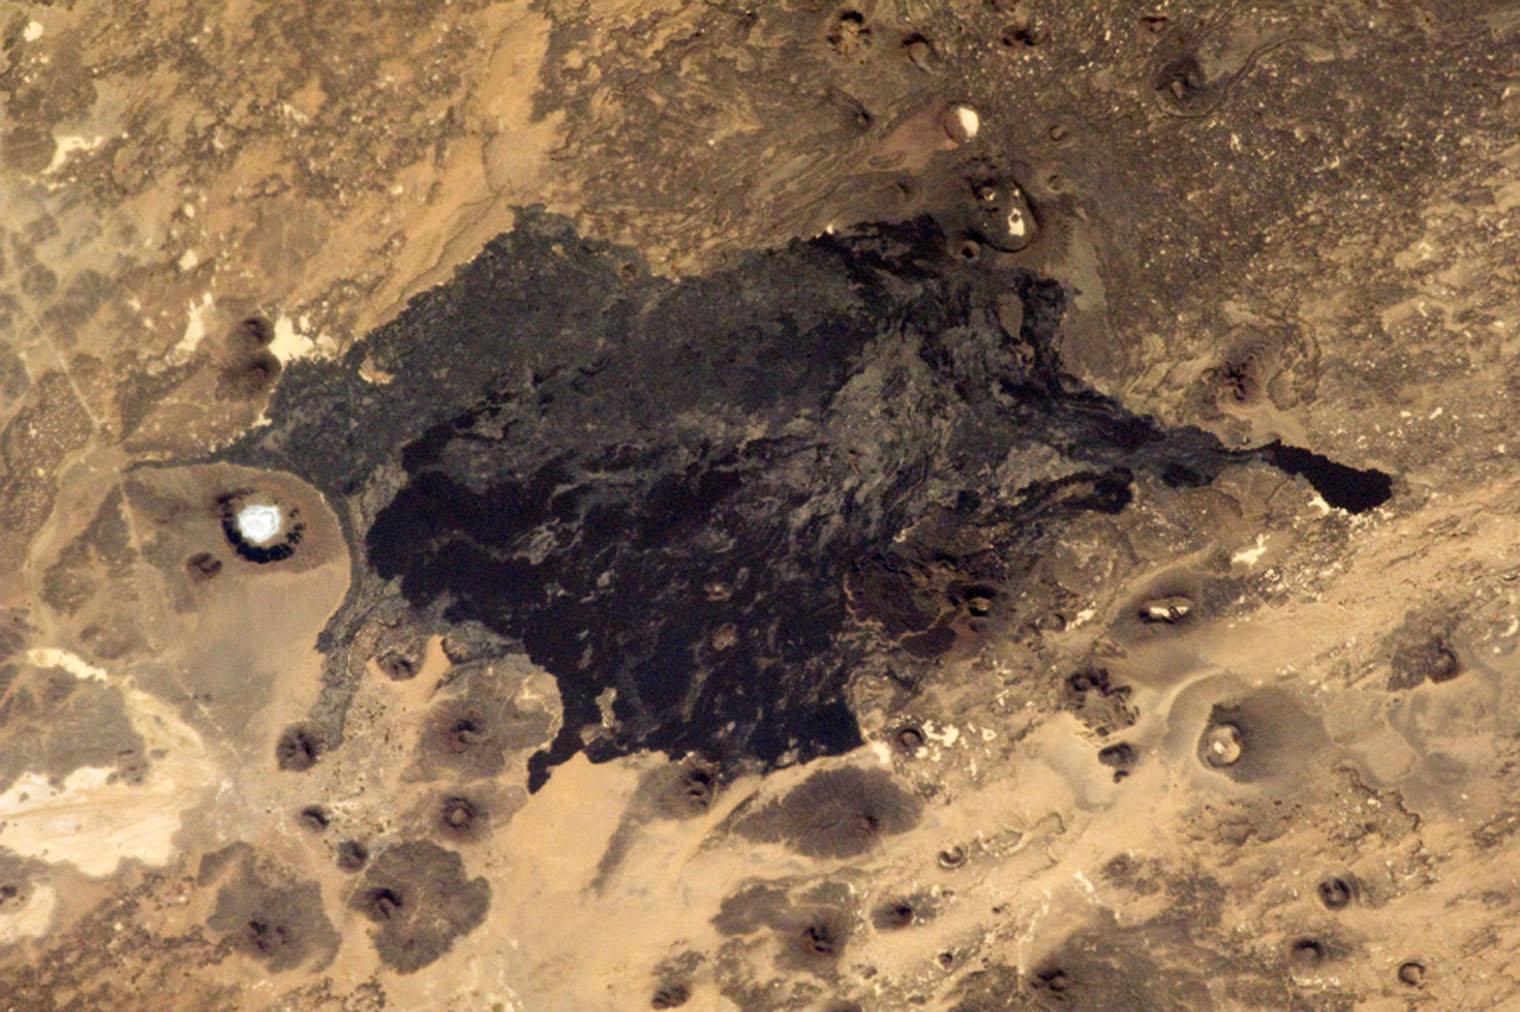 The Saudi Arabian desert